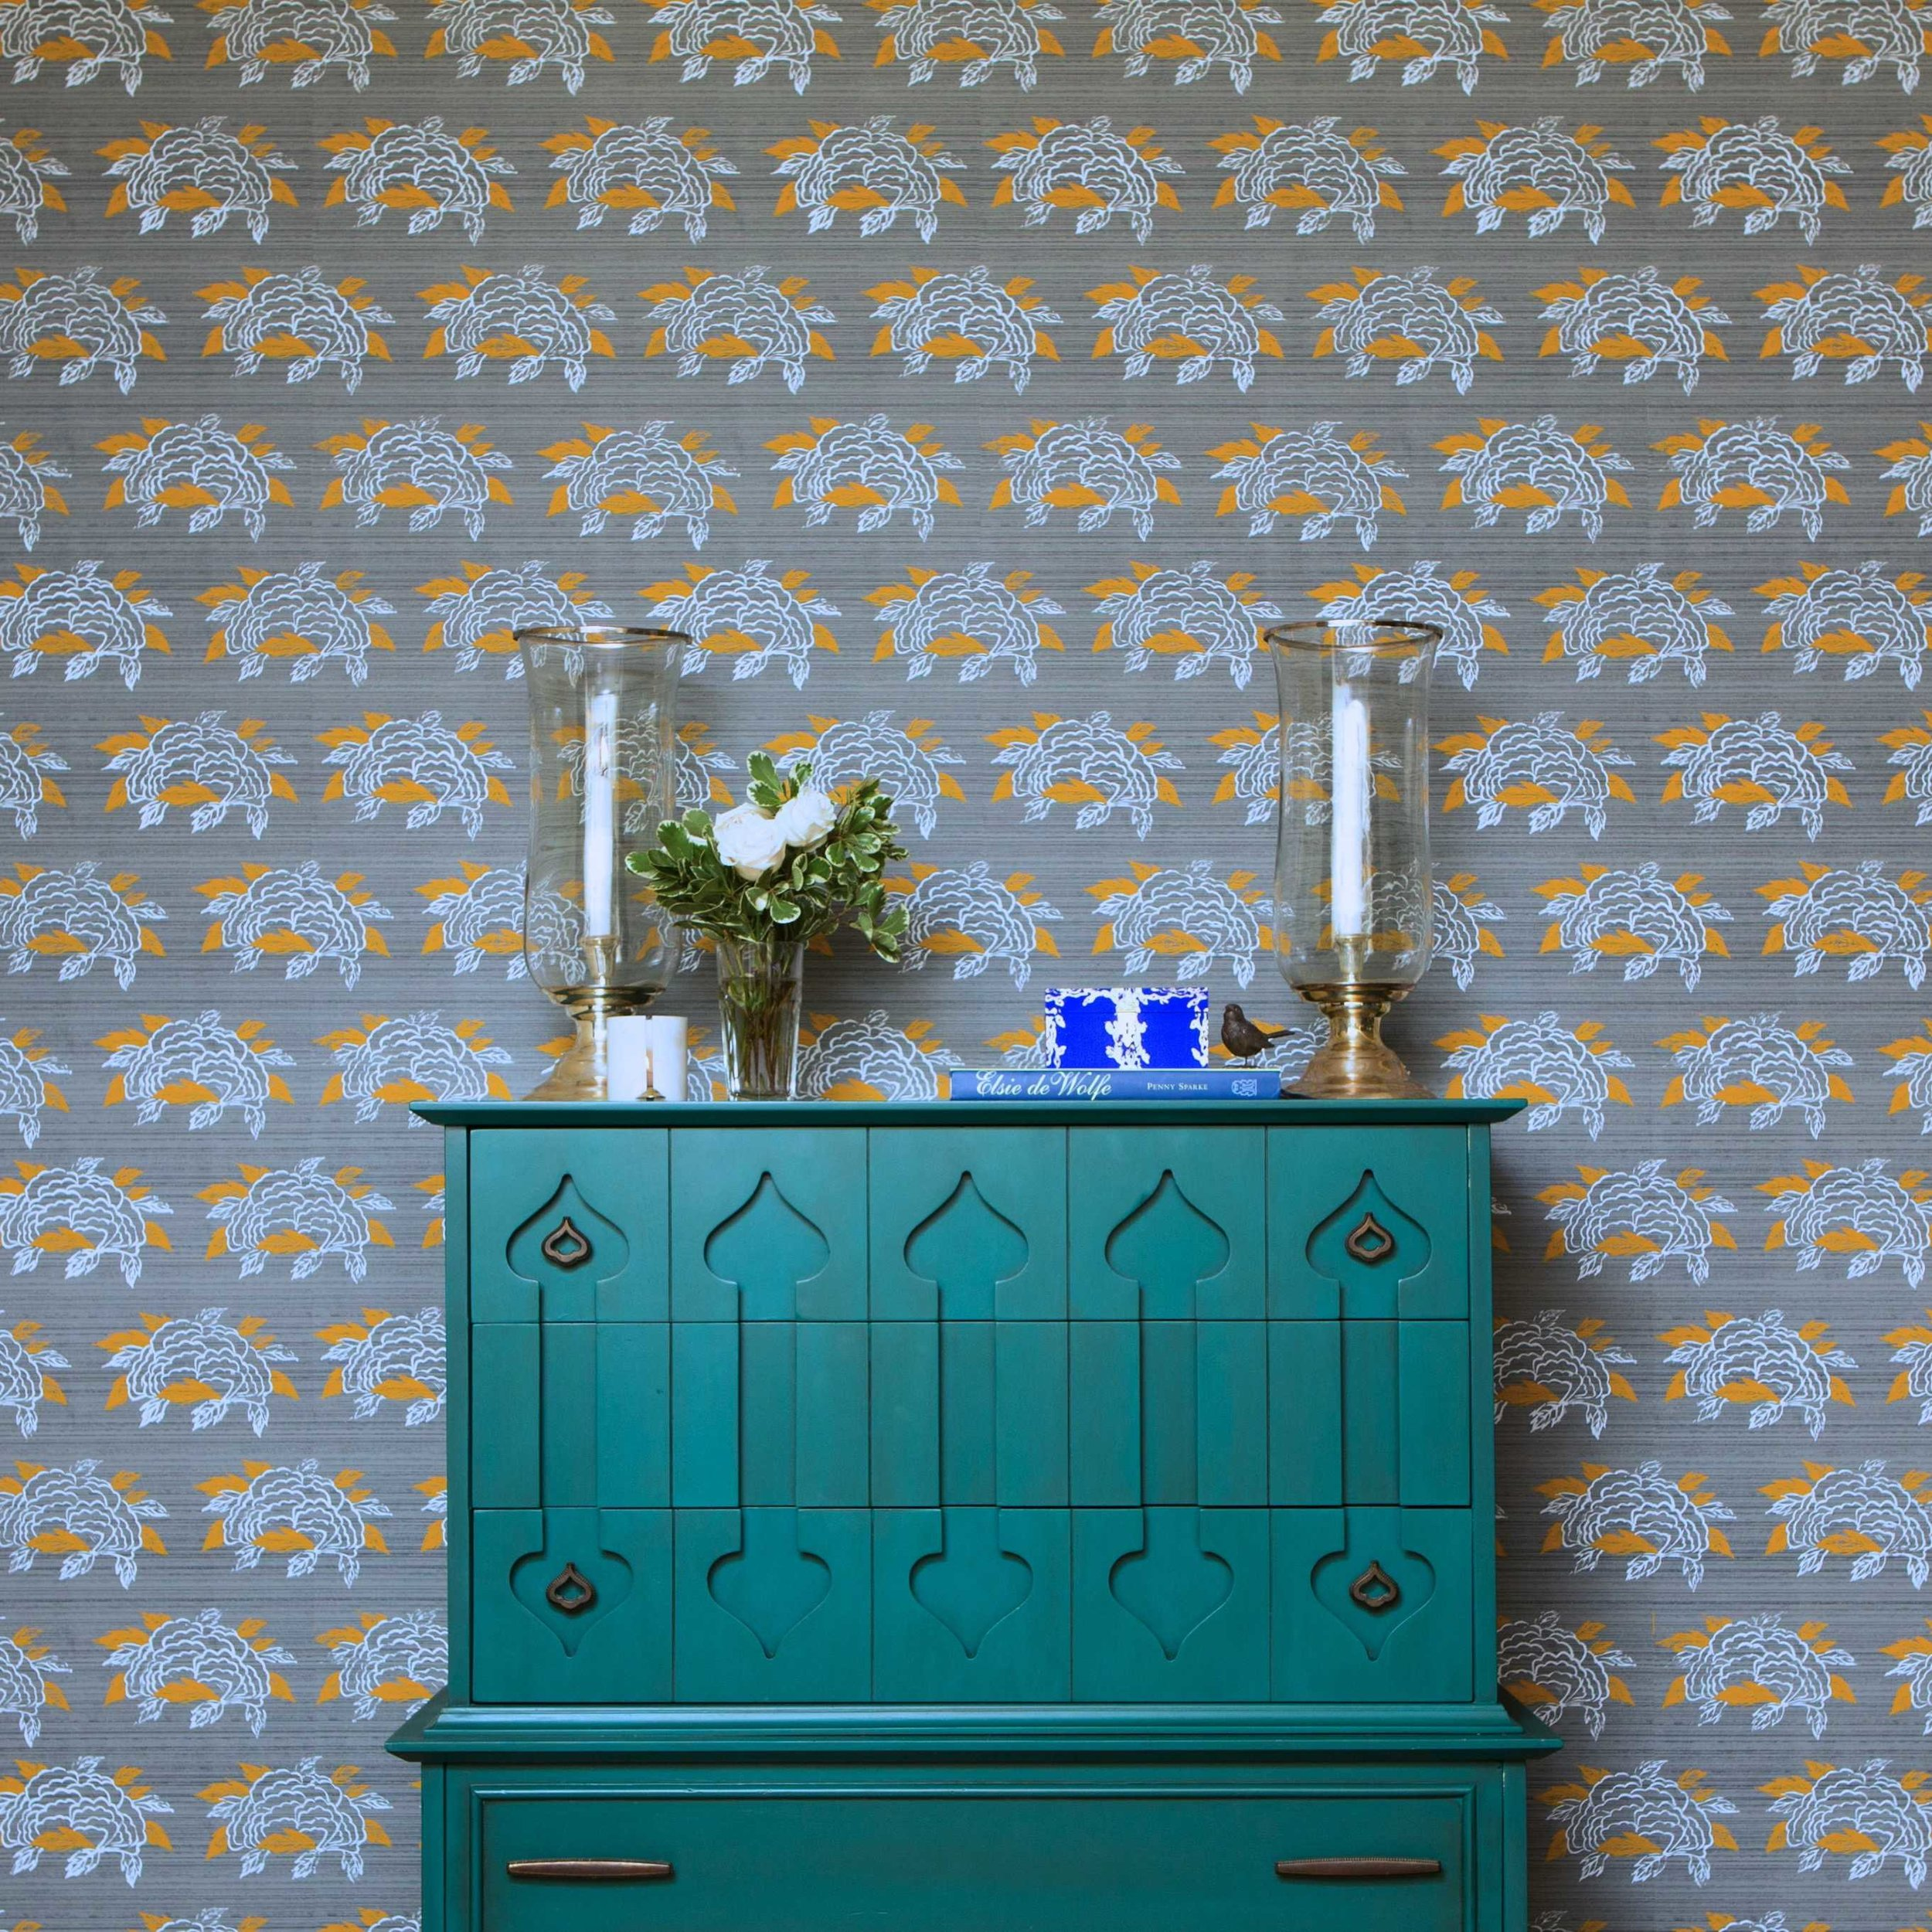 Chrysanthemum Wallpaper in French Grey, Photo by Benjamin Hoffman